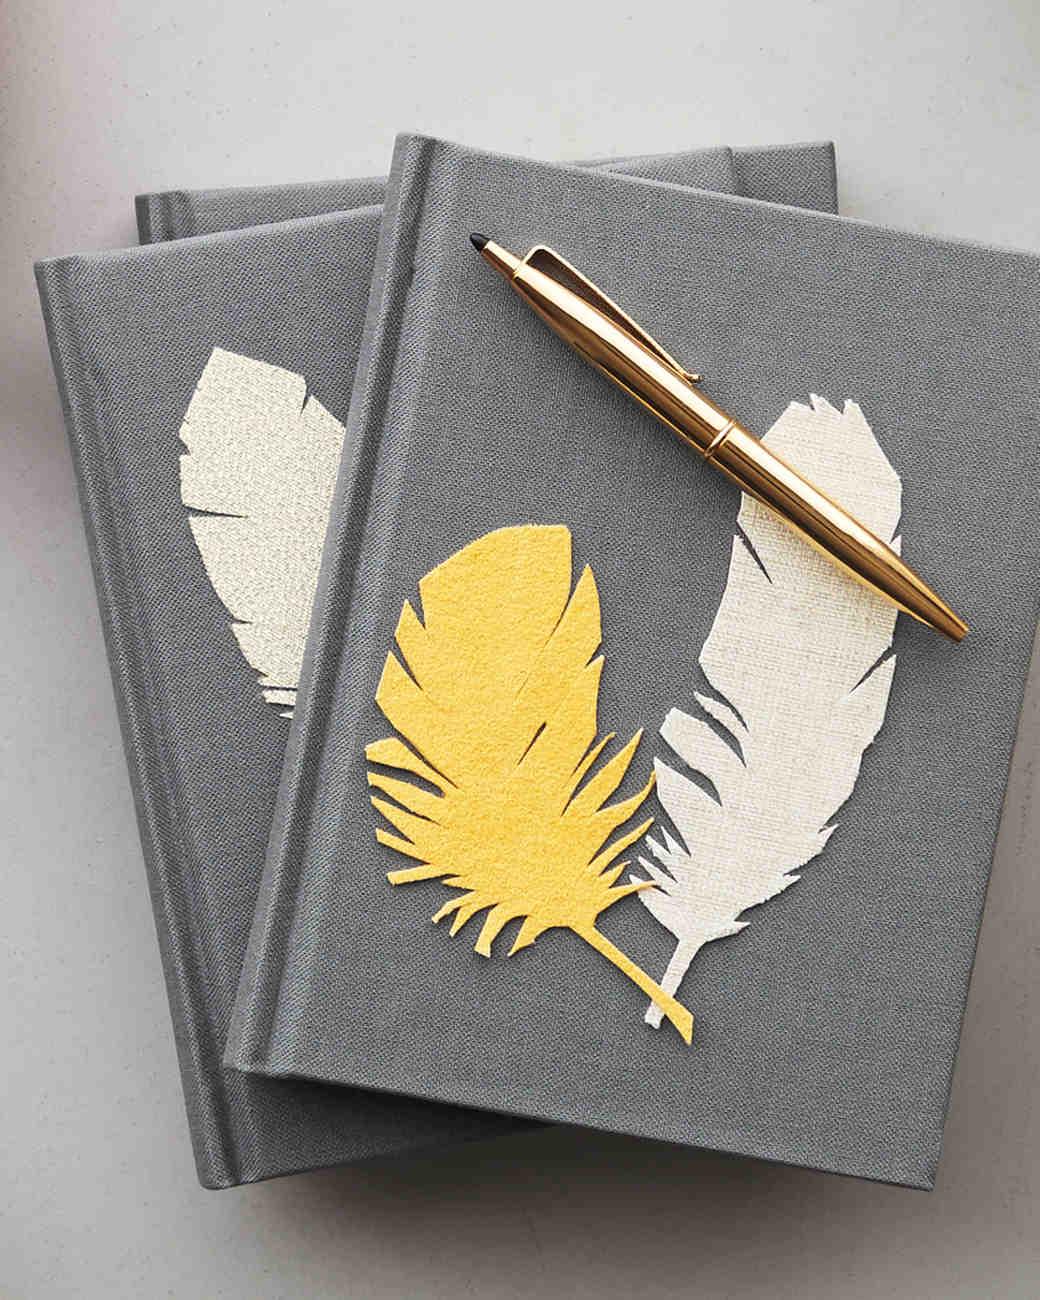 diy-bridesmaid-gifts-feather-fabric-stickered-notebook-su14-0515.jpg